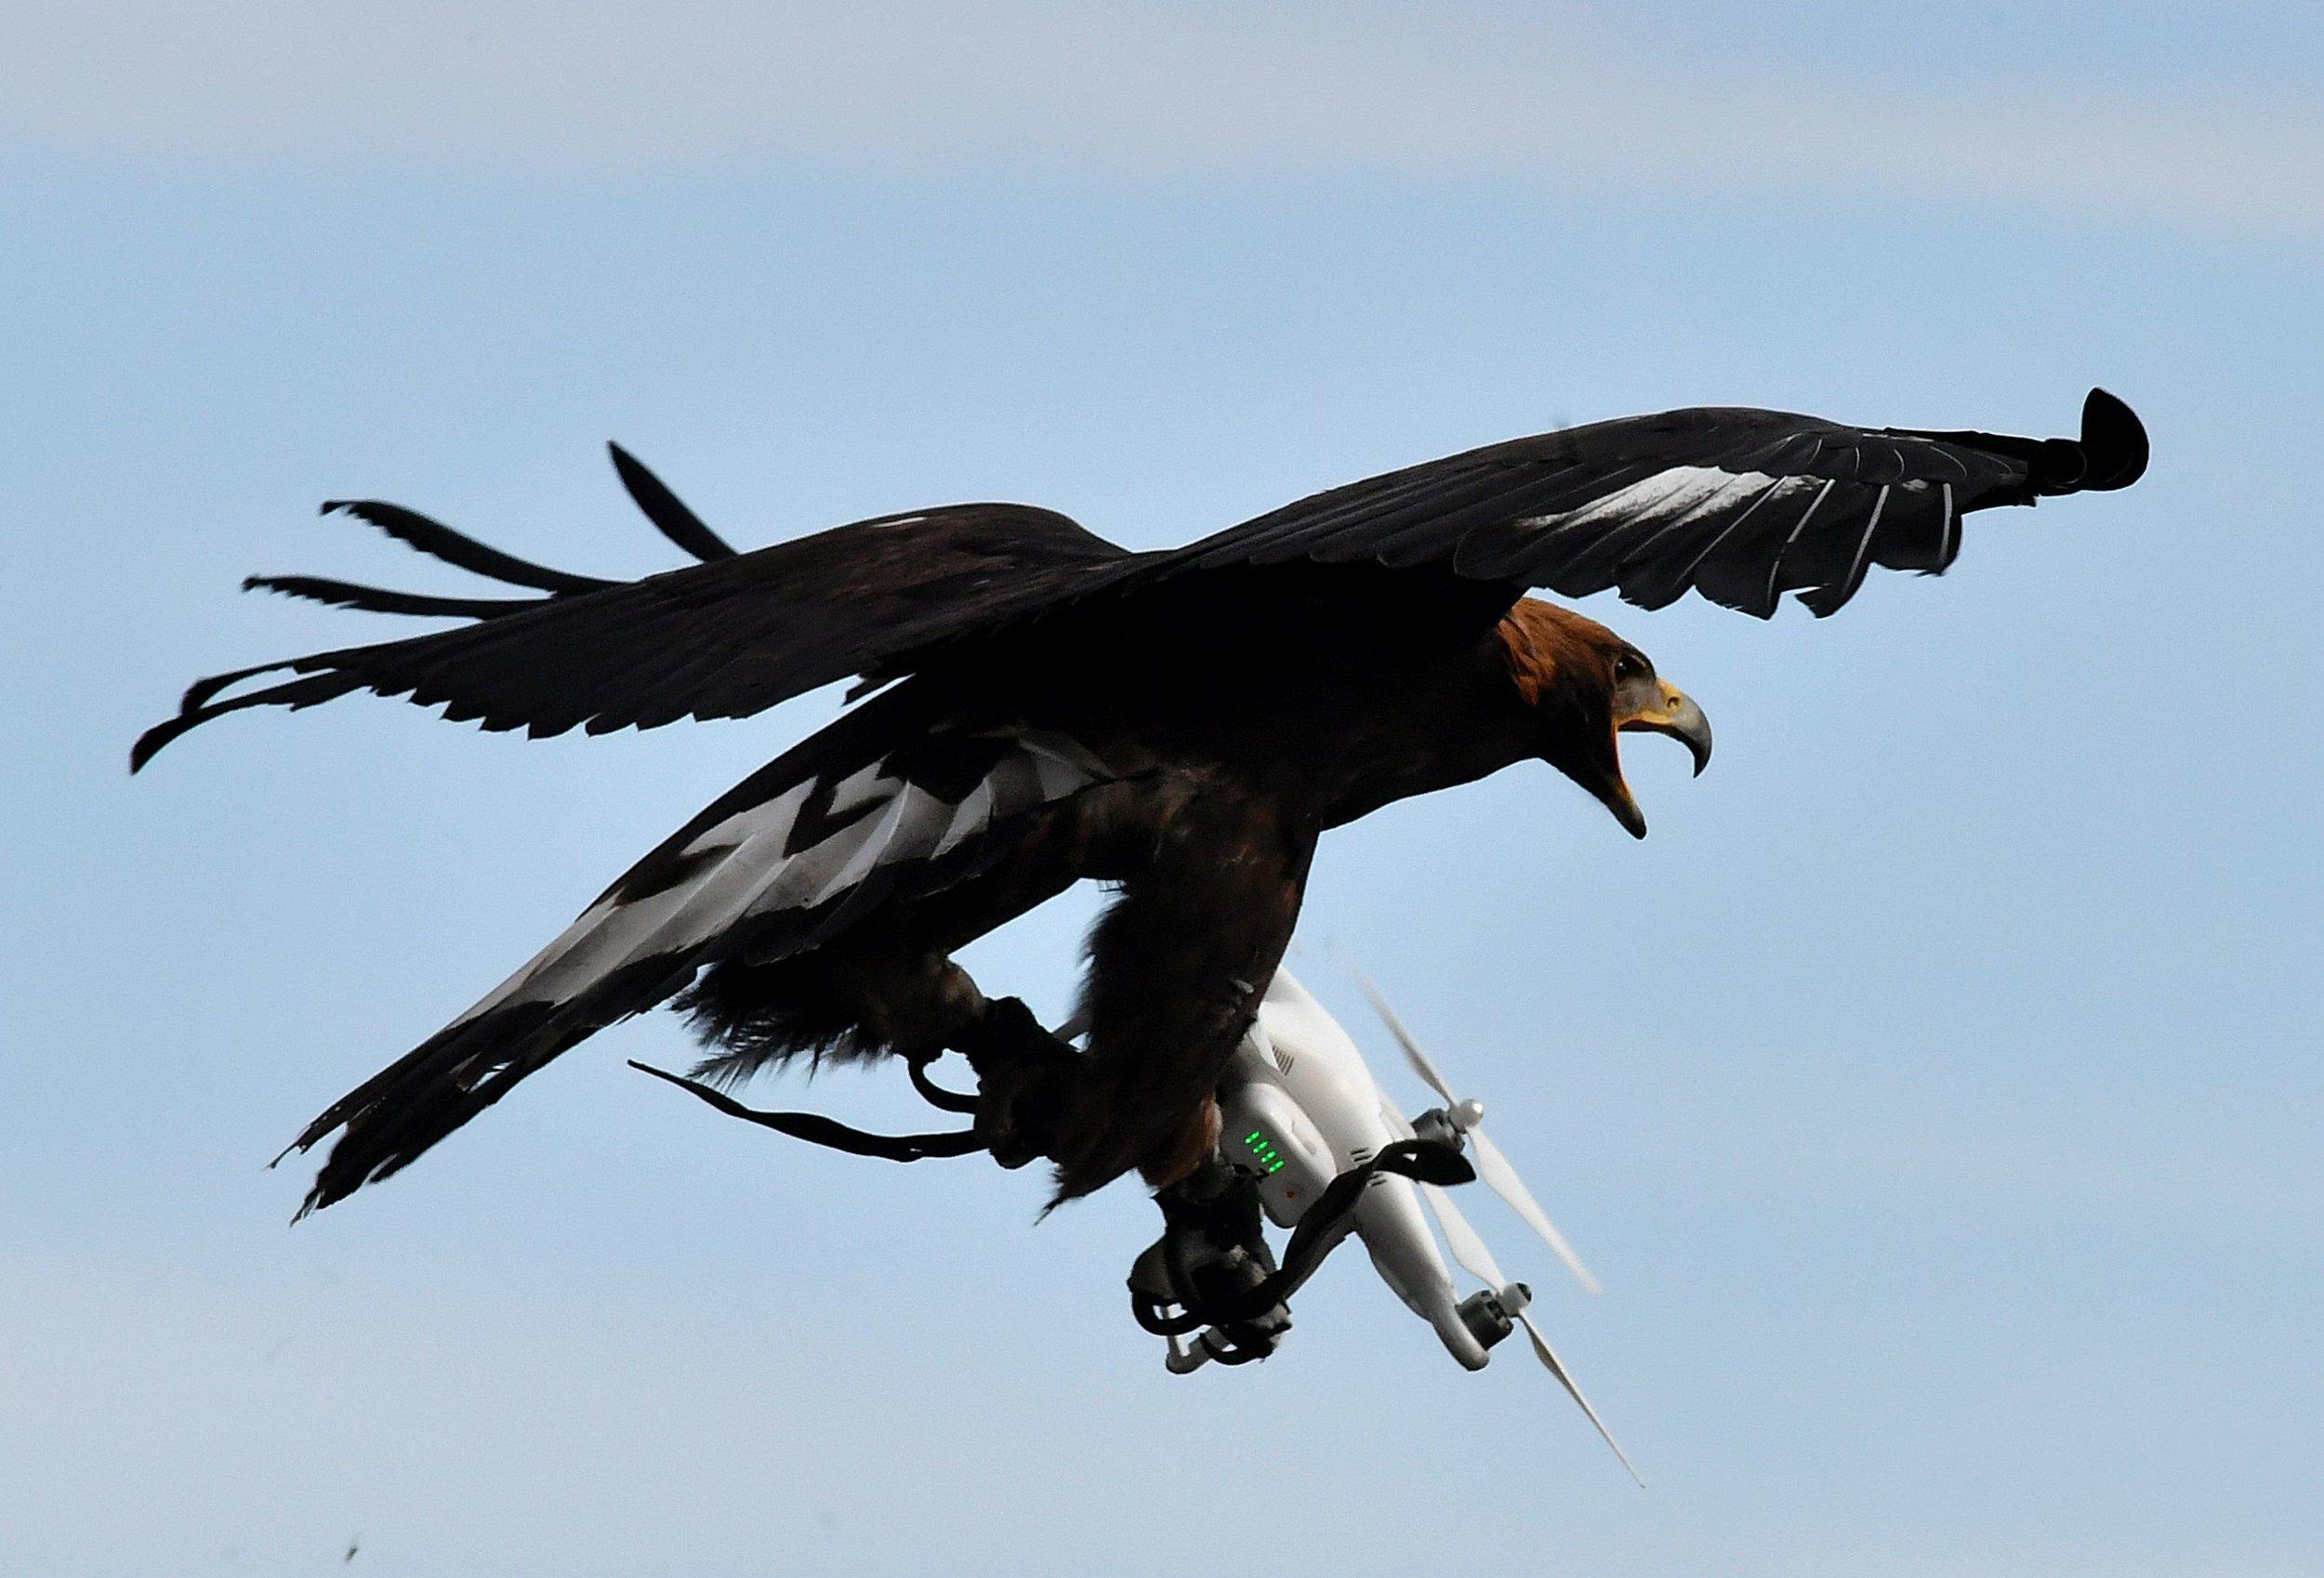 HAWK_DRONE.jpg